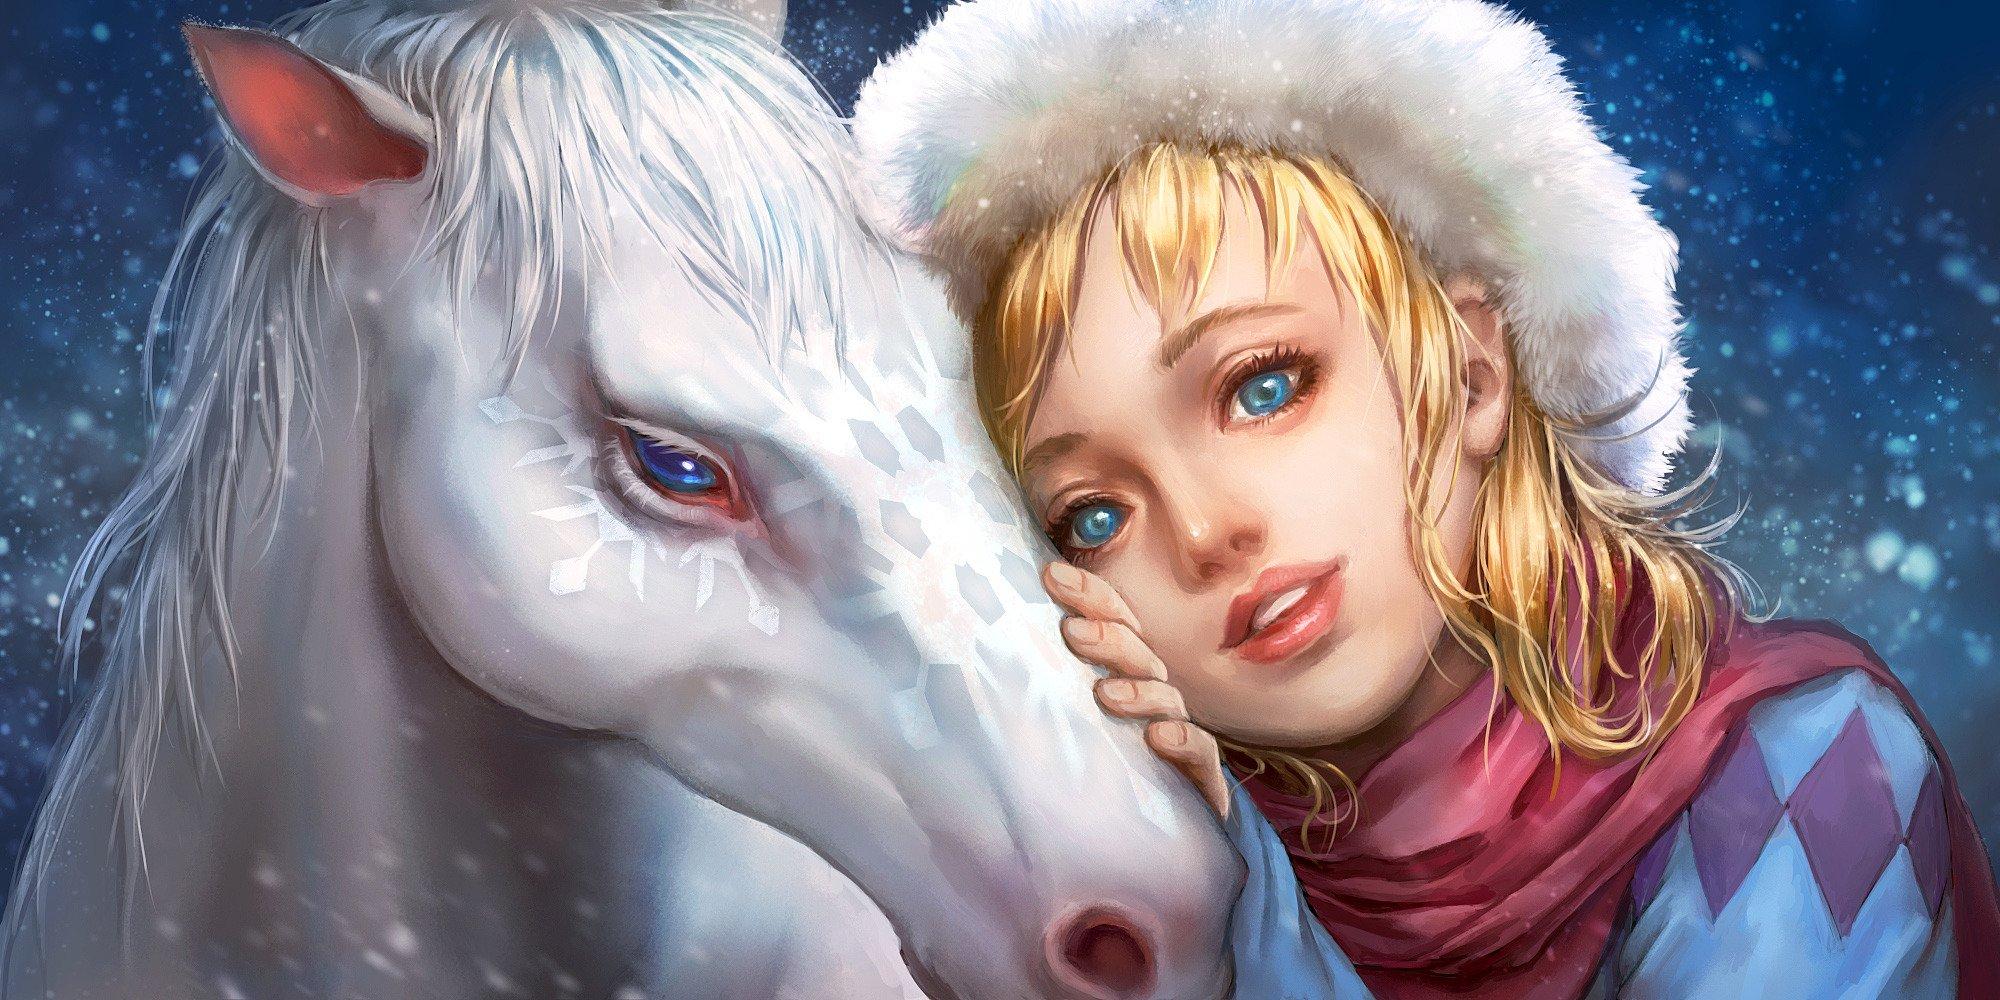 women fantasy eyes blue - photo #42